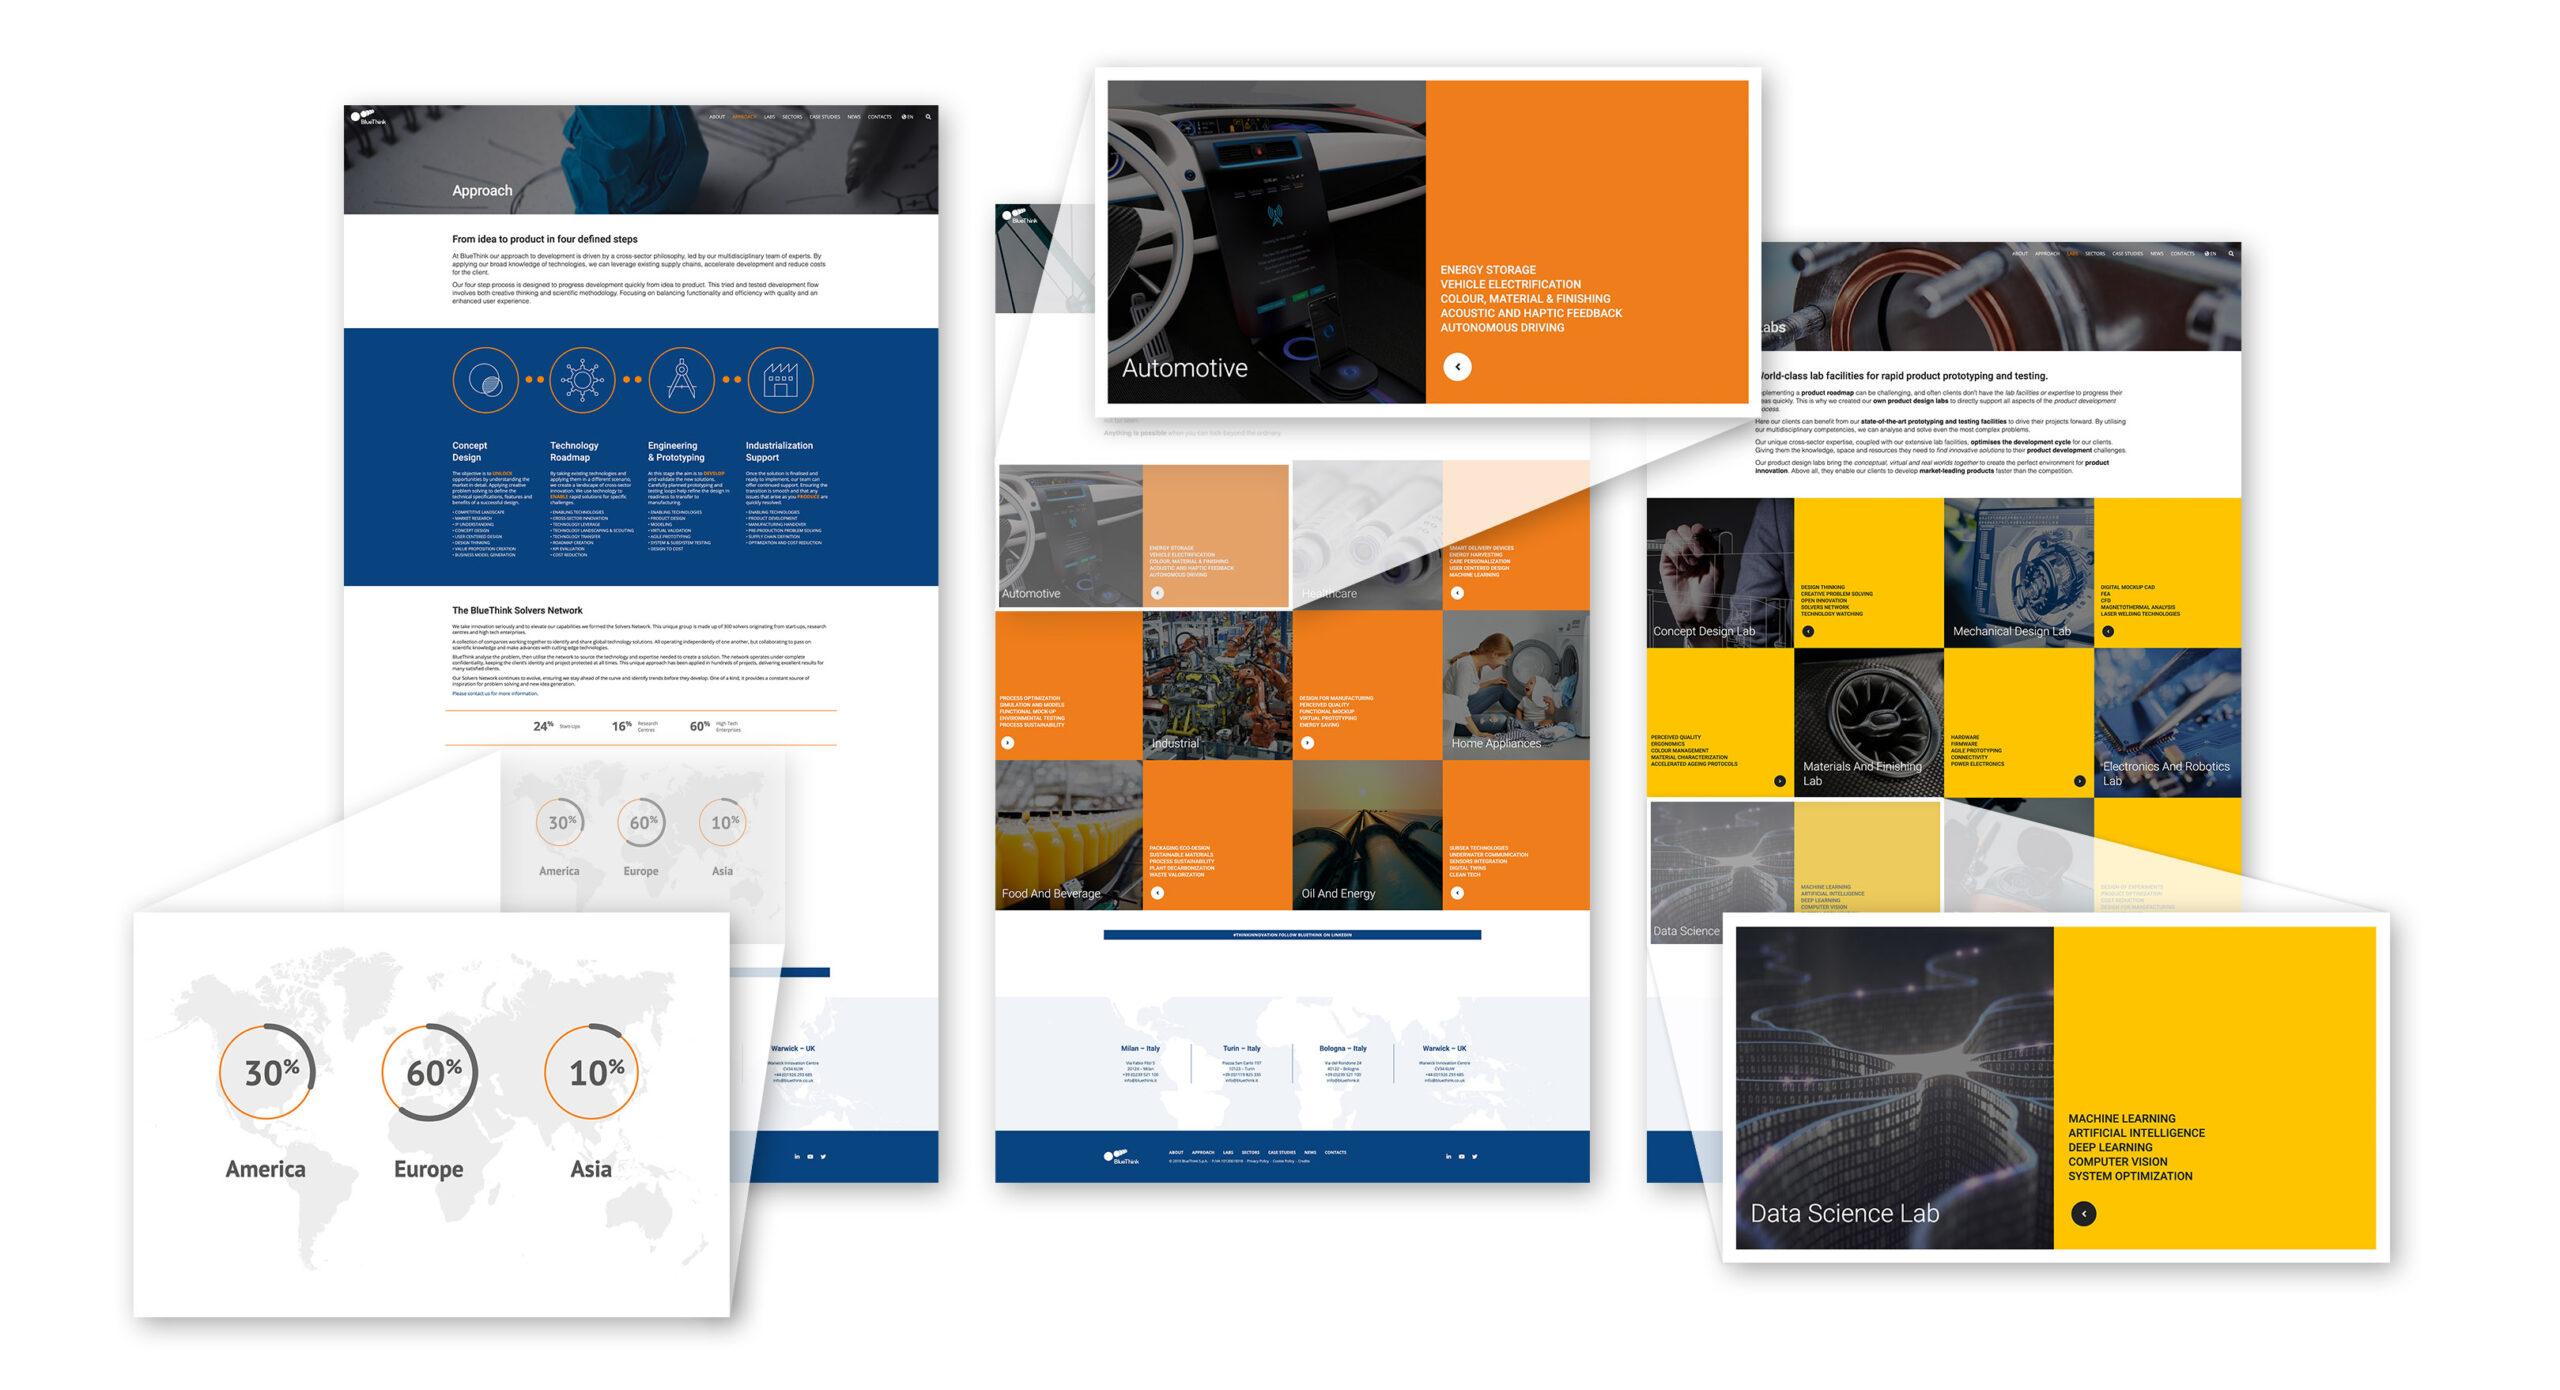 KFDS - Bluethink Case Study Internal Pages